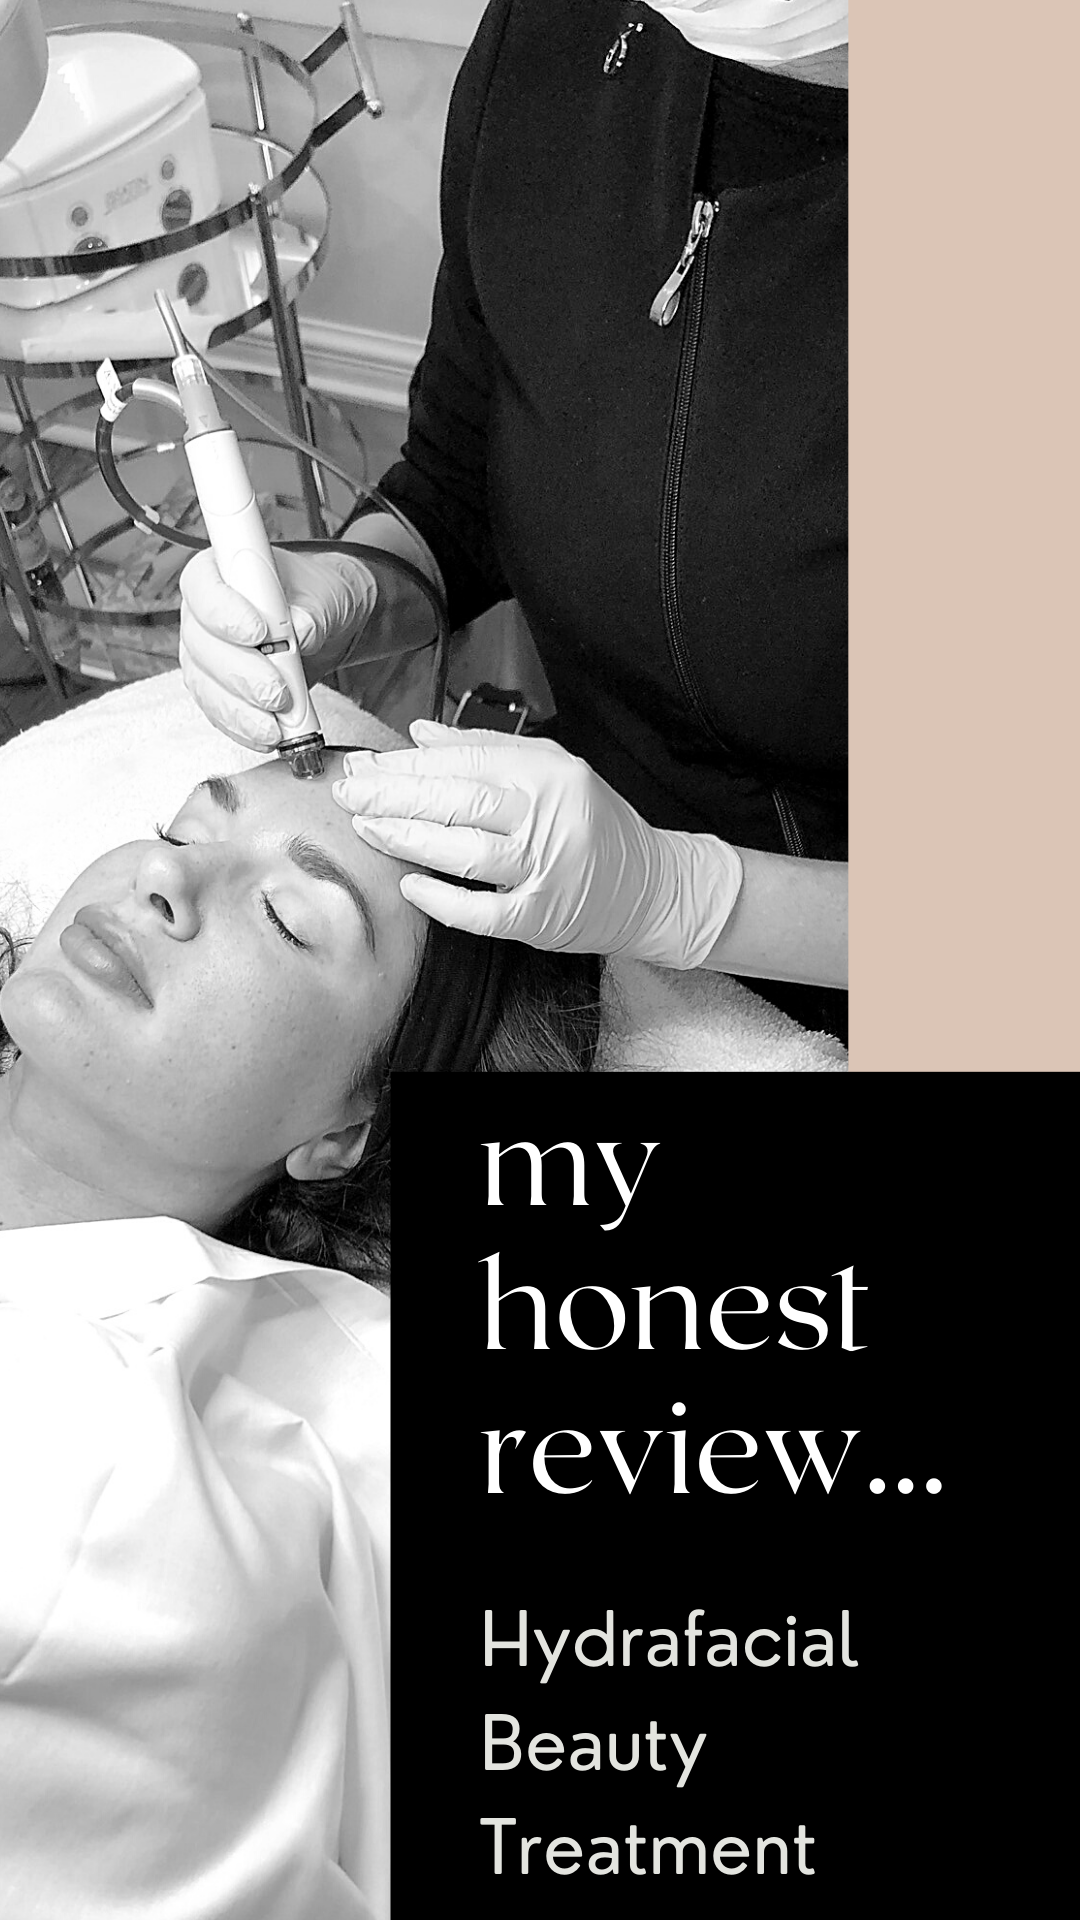 Hydrafacial beauty treatment review